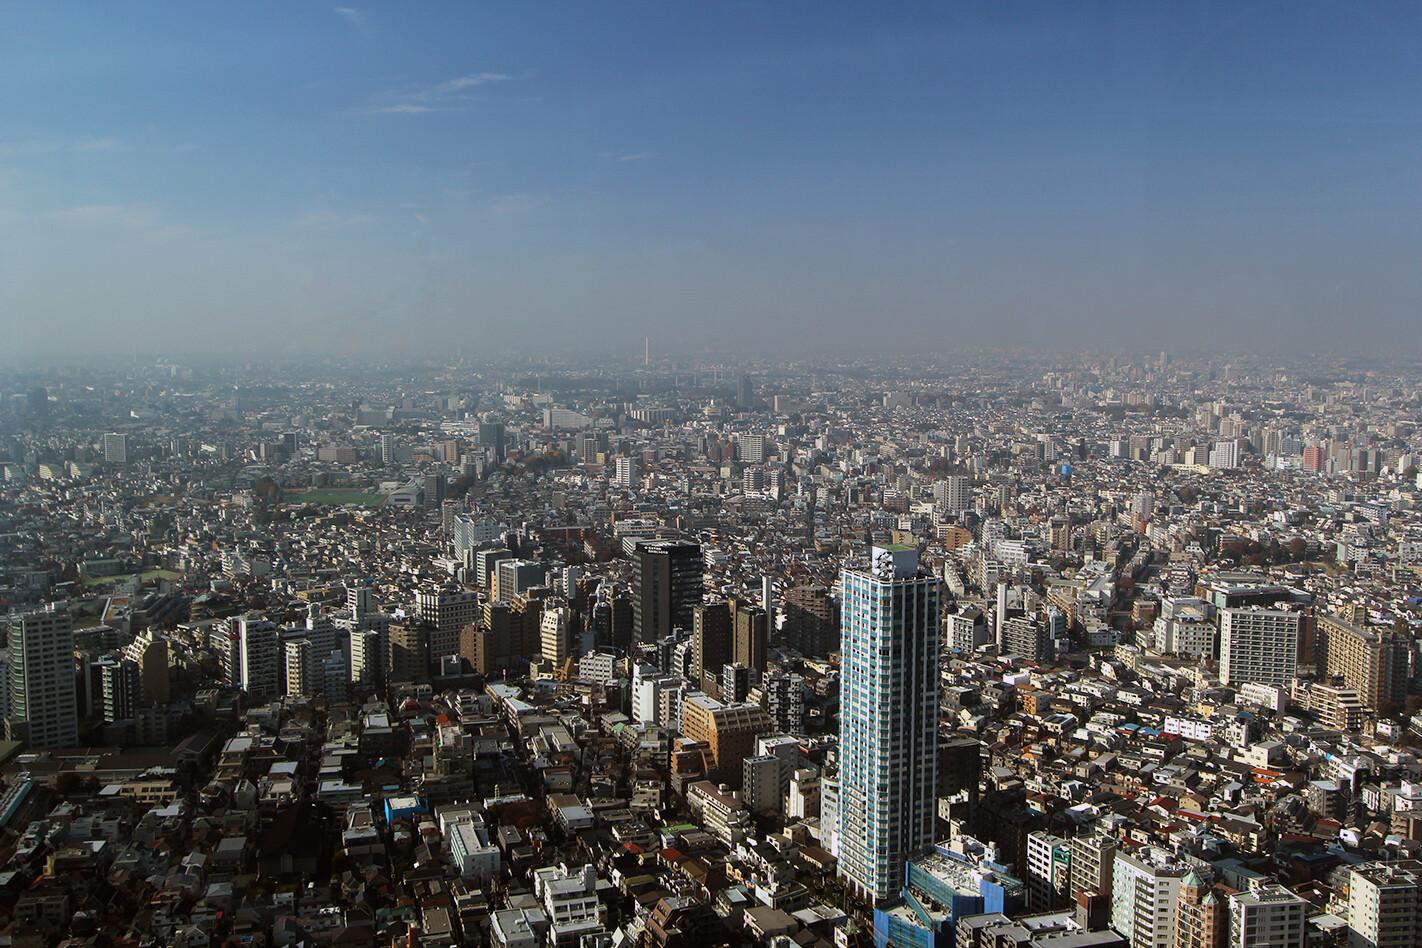 Tokyo - hazy day